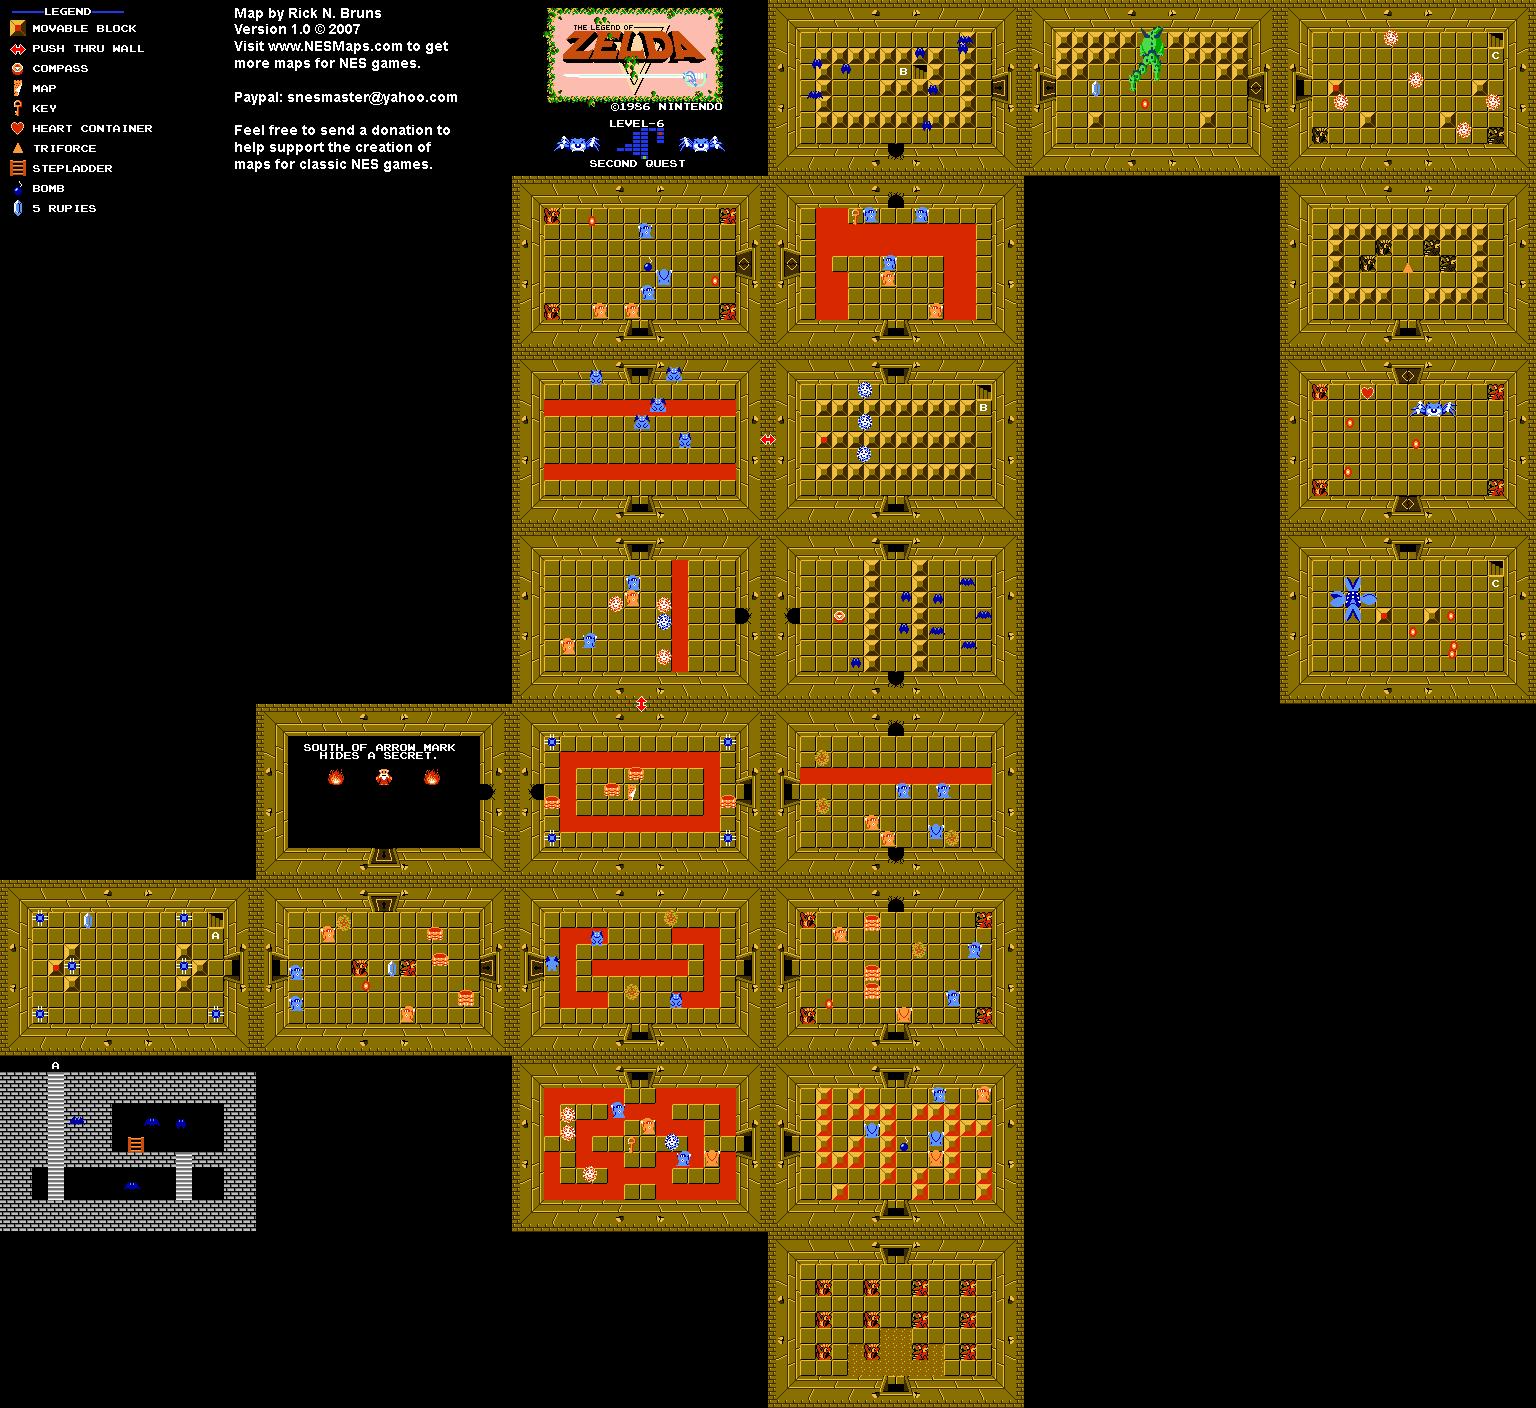 The Legend Of Zelda Level 6 Quest 2 Map